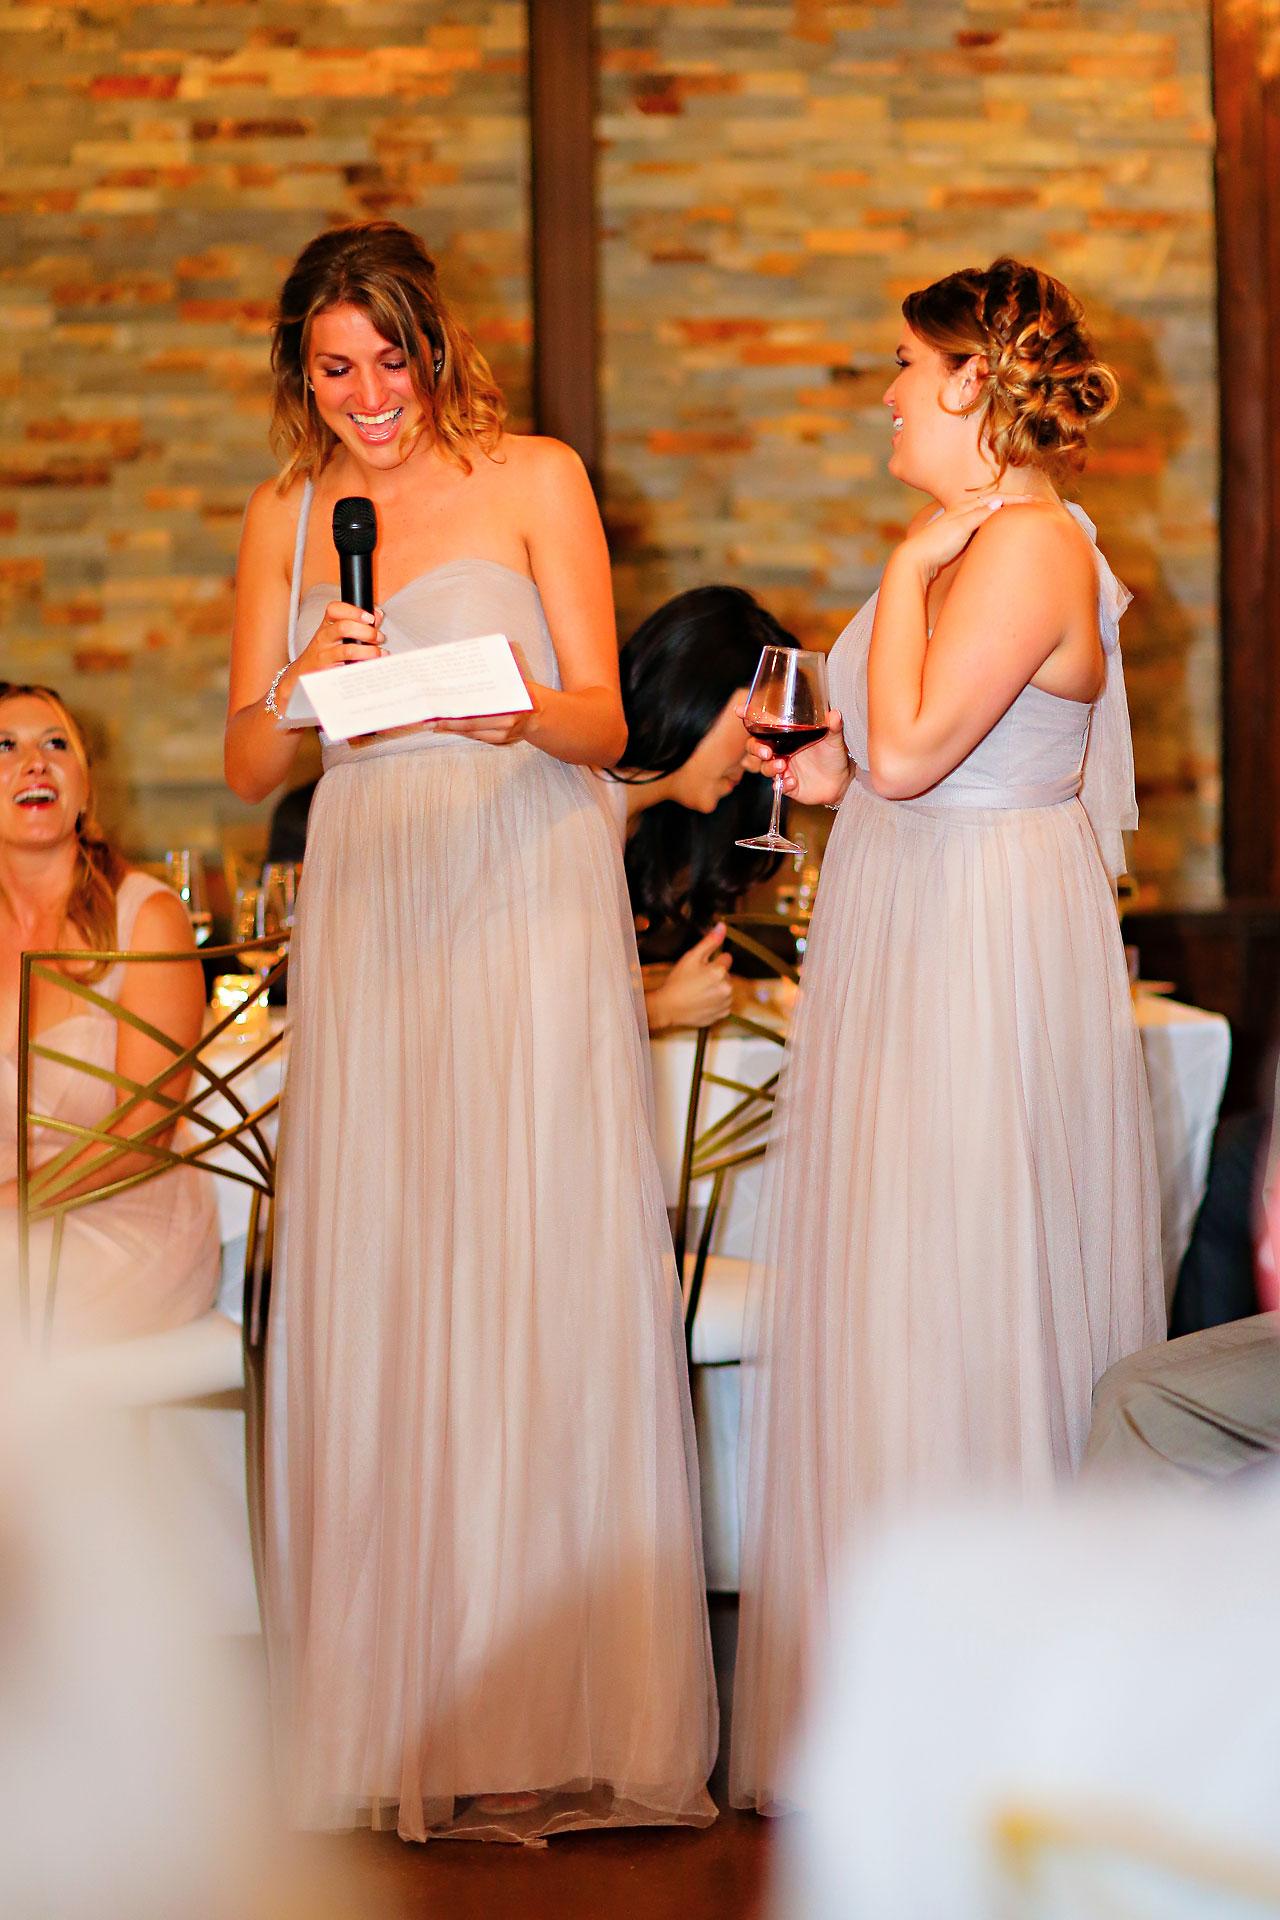 Amy Nick Canal 337 Wedding 203